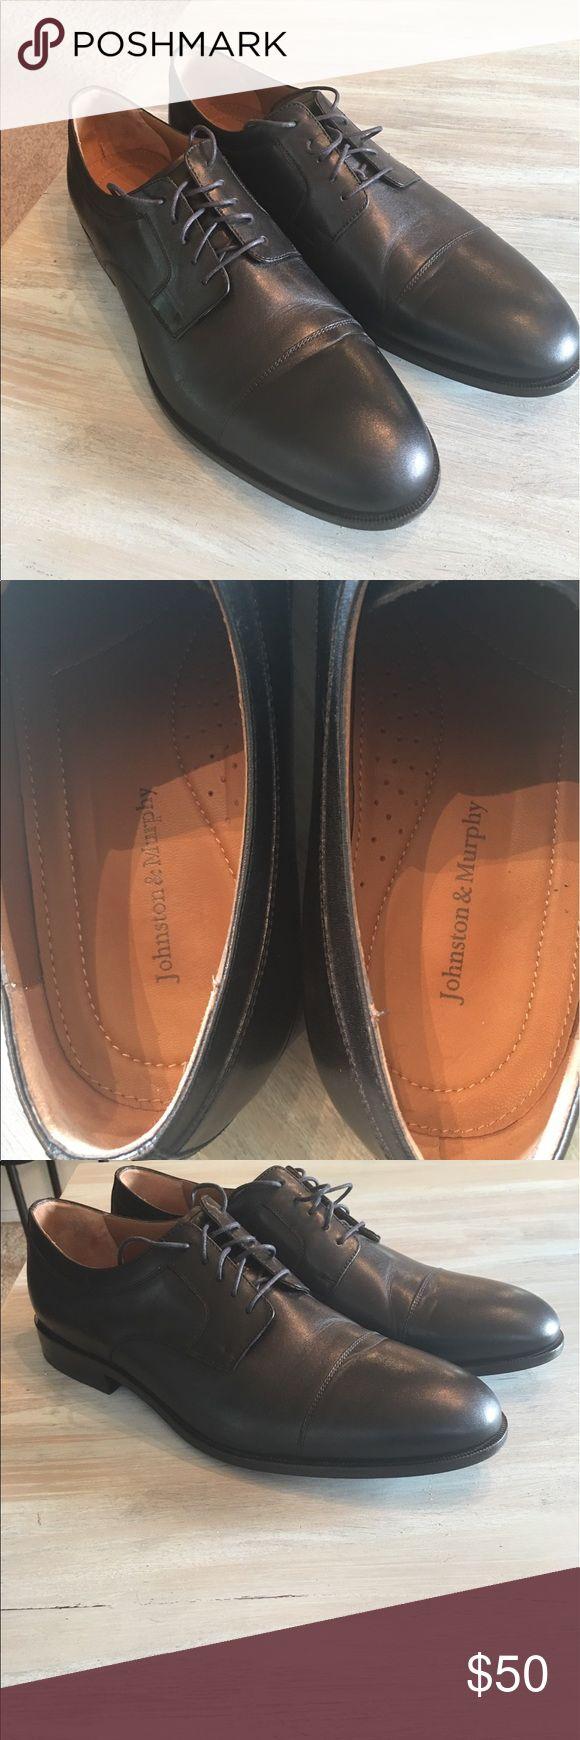 Johnston and Murphy black dress shoes Black Johnston and Murphy dress shoes. Barley worn. Men's US 14. Timeless style. Johnston & Murphy Shoes Oxfords & Derbys